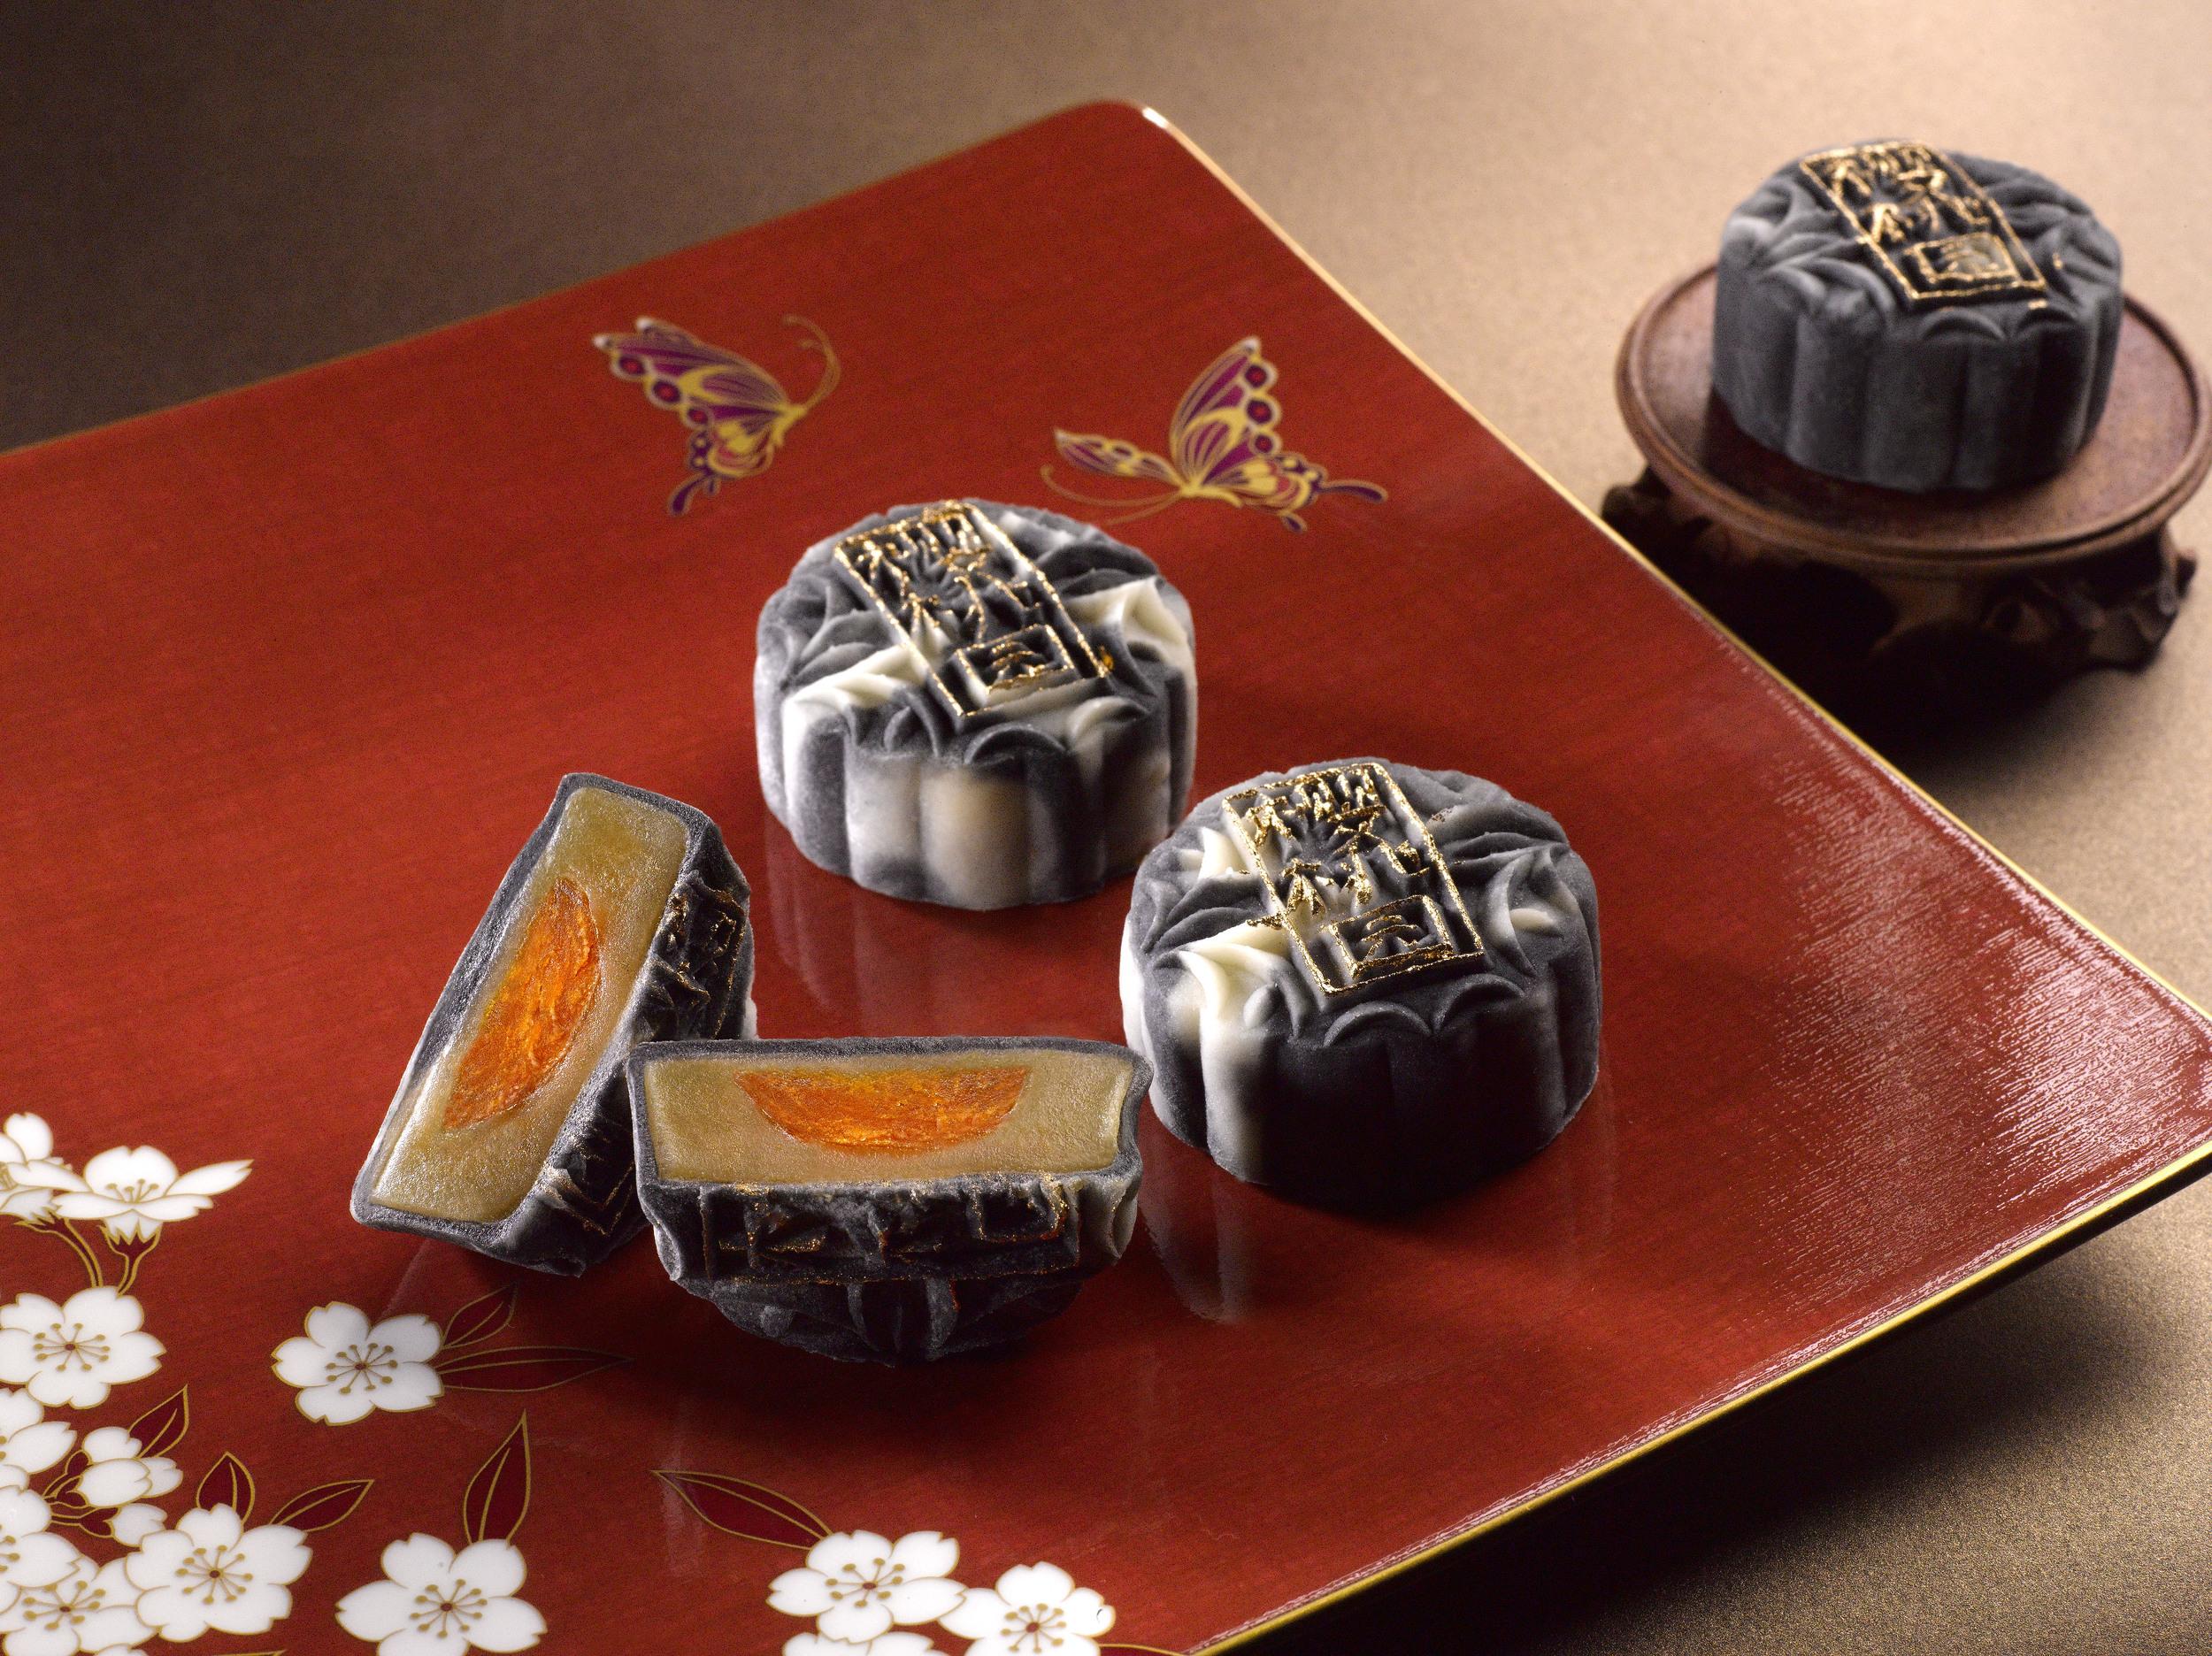 Charcoal Snow Skin Mooncake with Truffle Oil, Lotus Paste and Egg Yolk   Photo Credit: Mandarin Oriental, Singapore